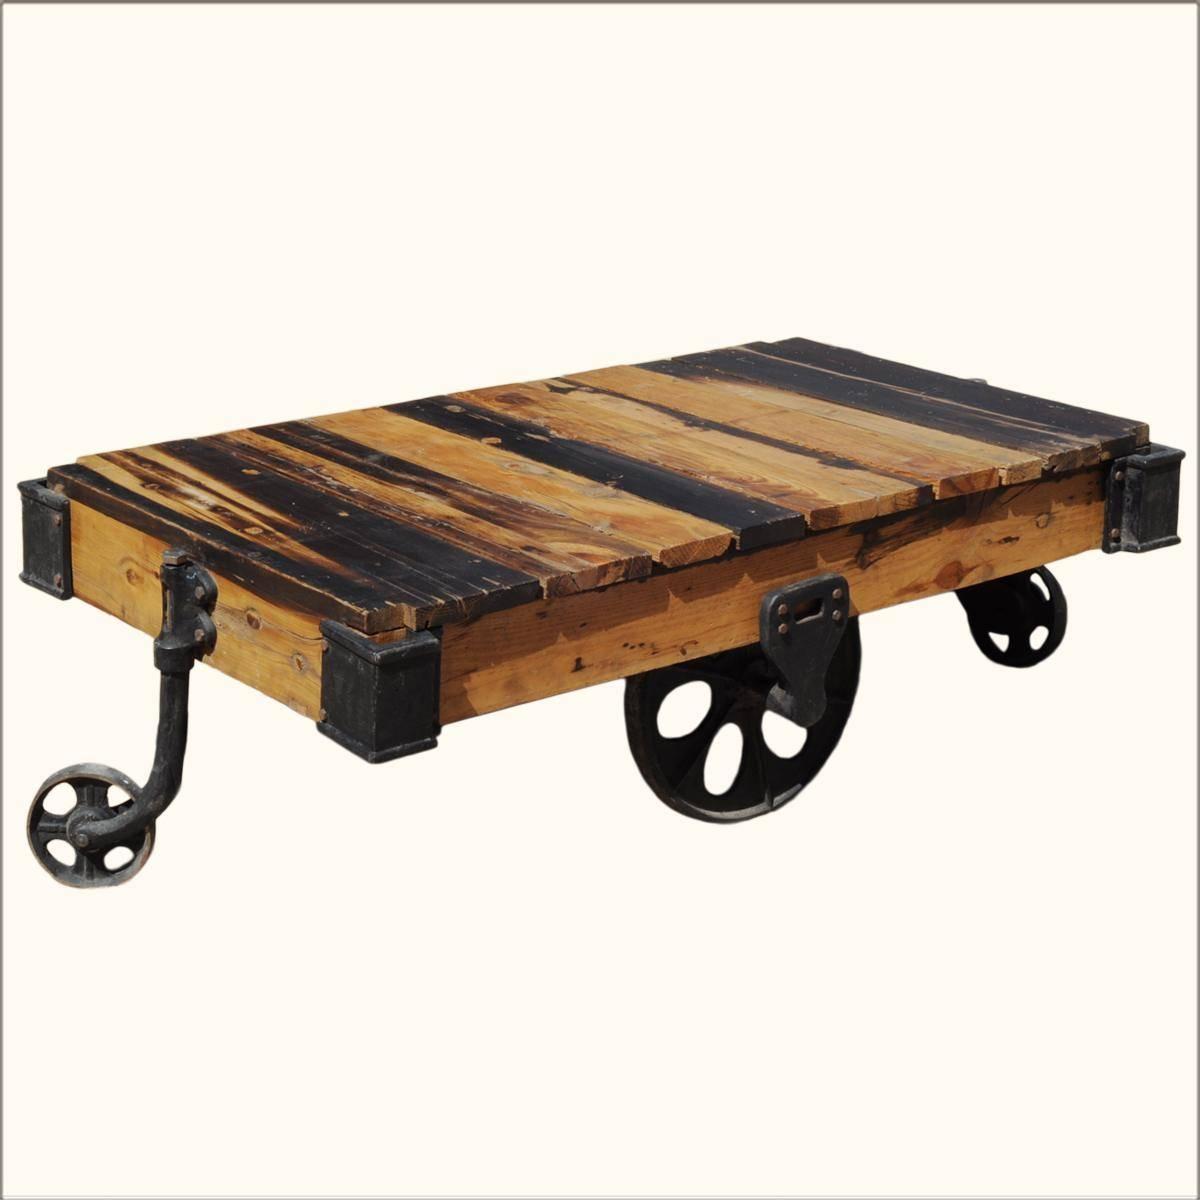 Reclaimed Wood Pallet Industrial Coffee Table On Wheels - Shakunt inside Wheels Coffee Tables (Image 20 of 30)